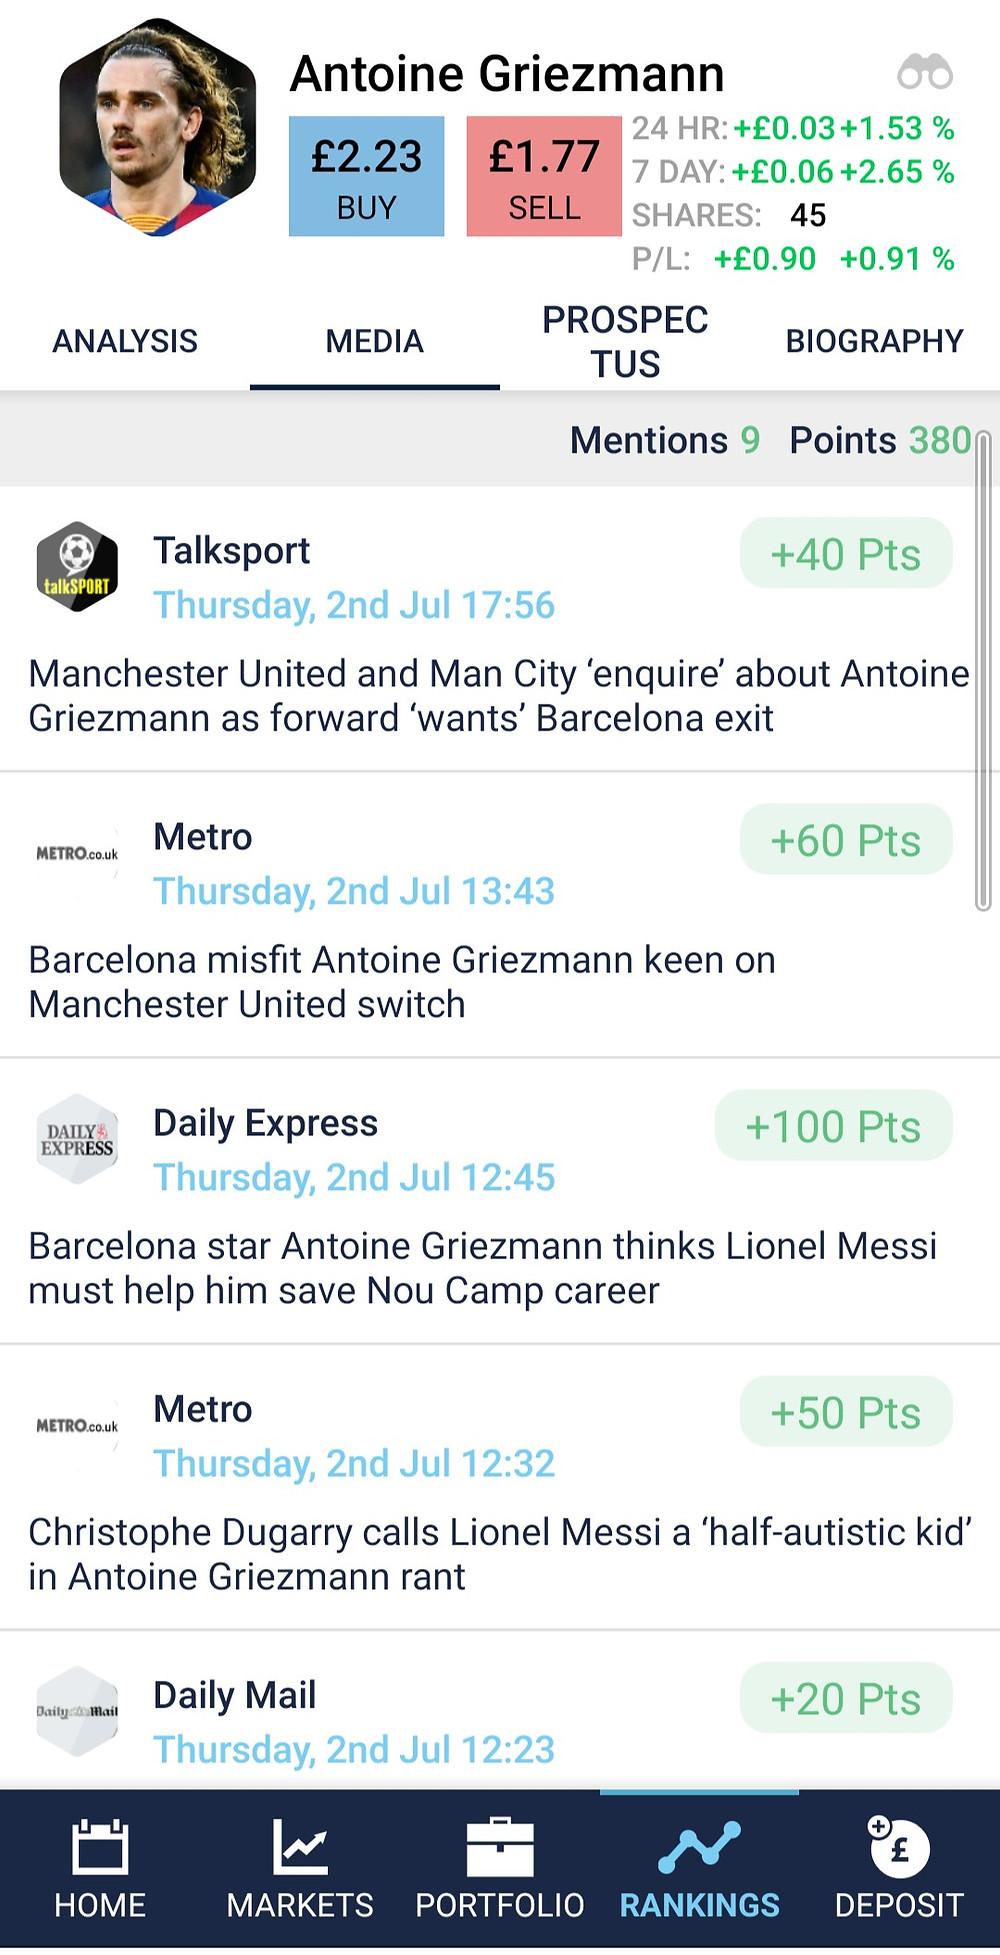 Antoine Griezmann Football Index Media Buzz Stories